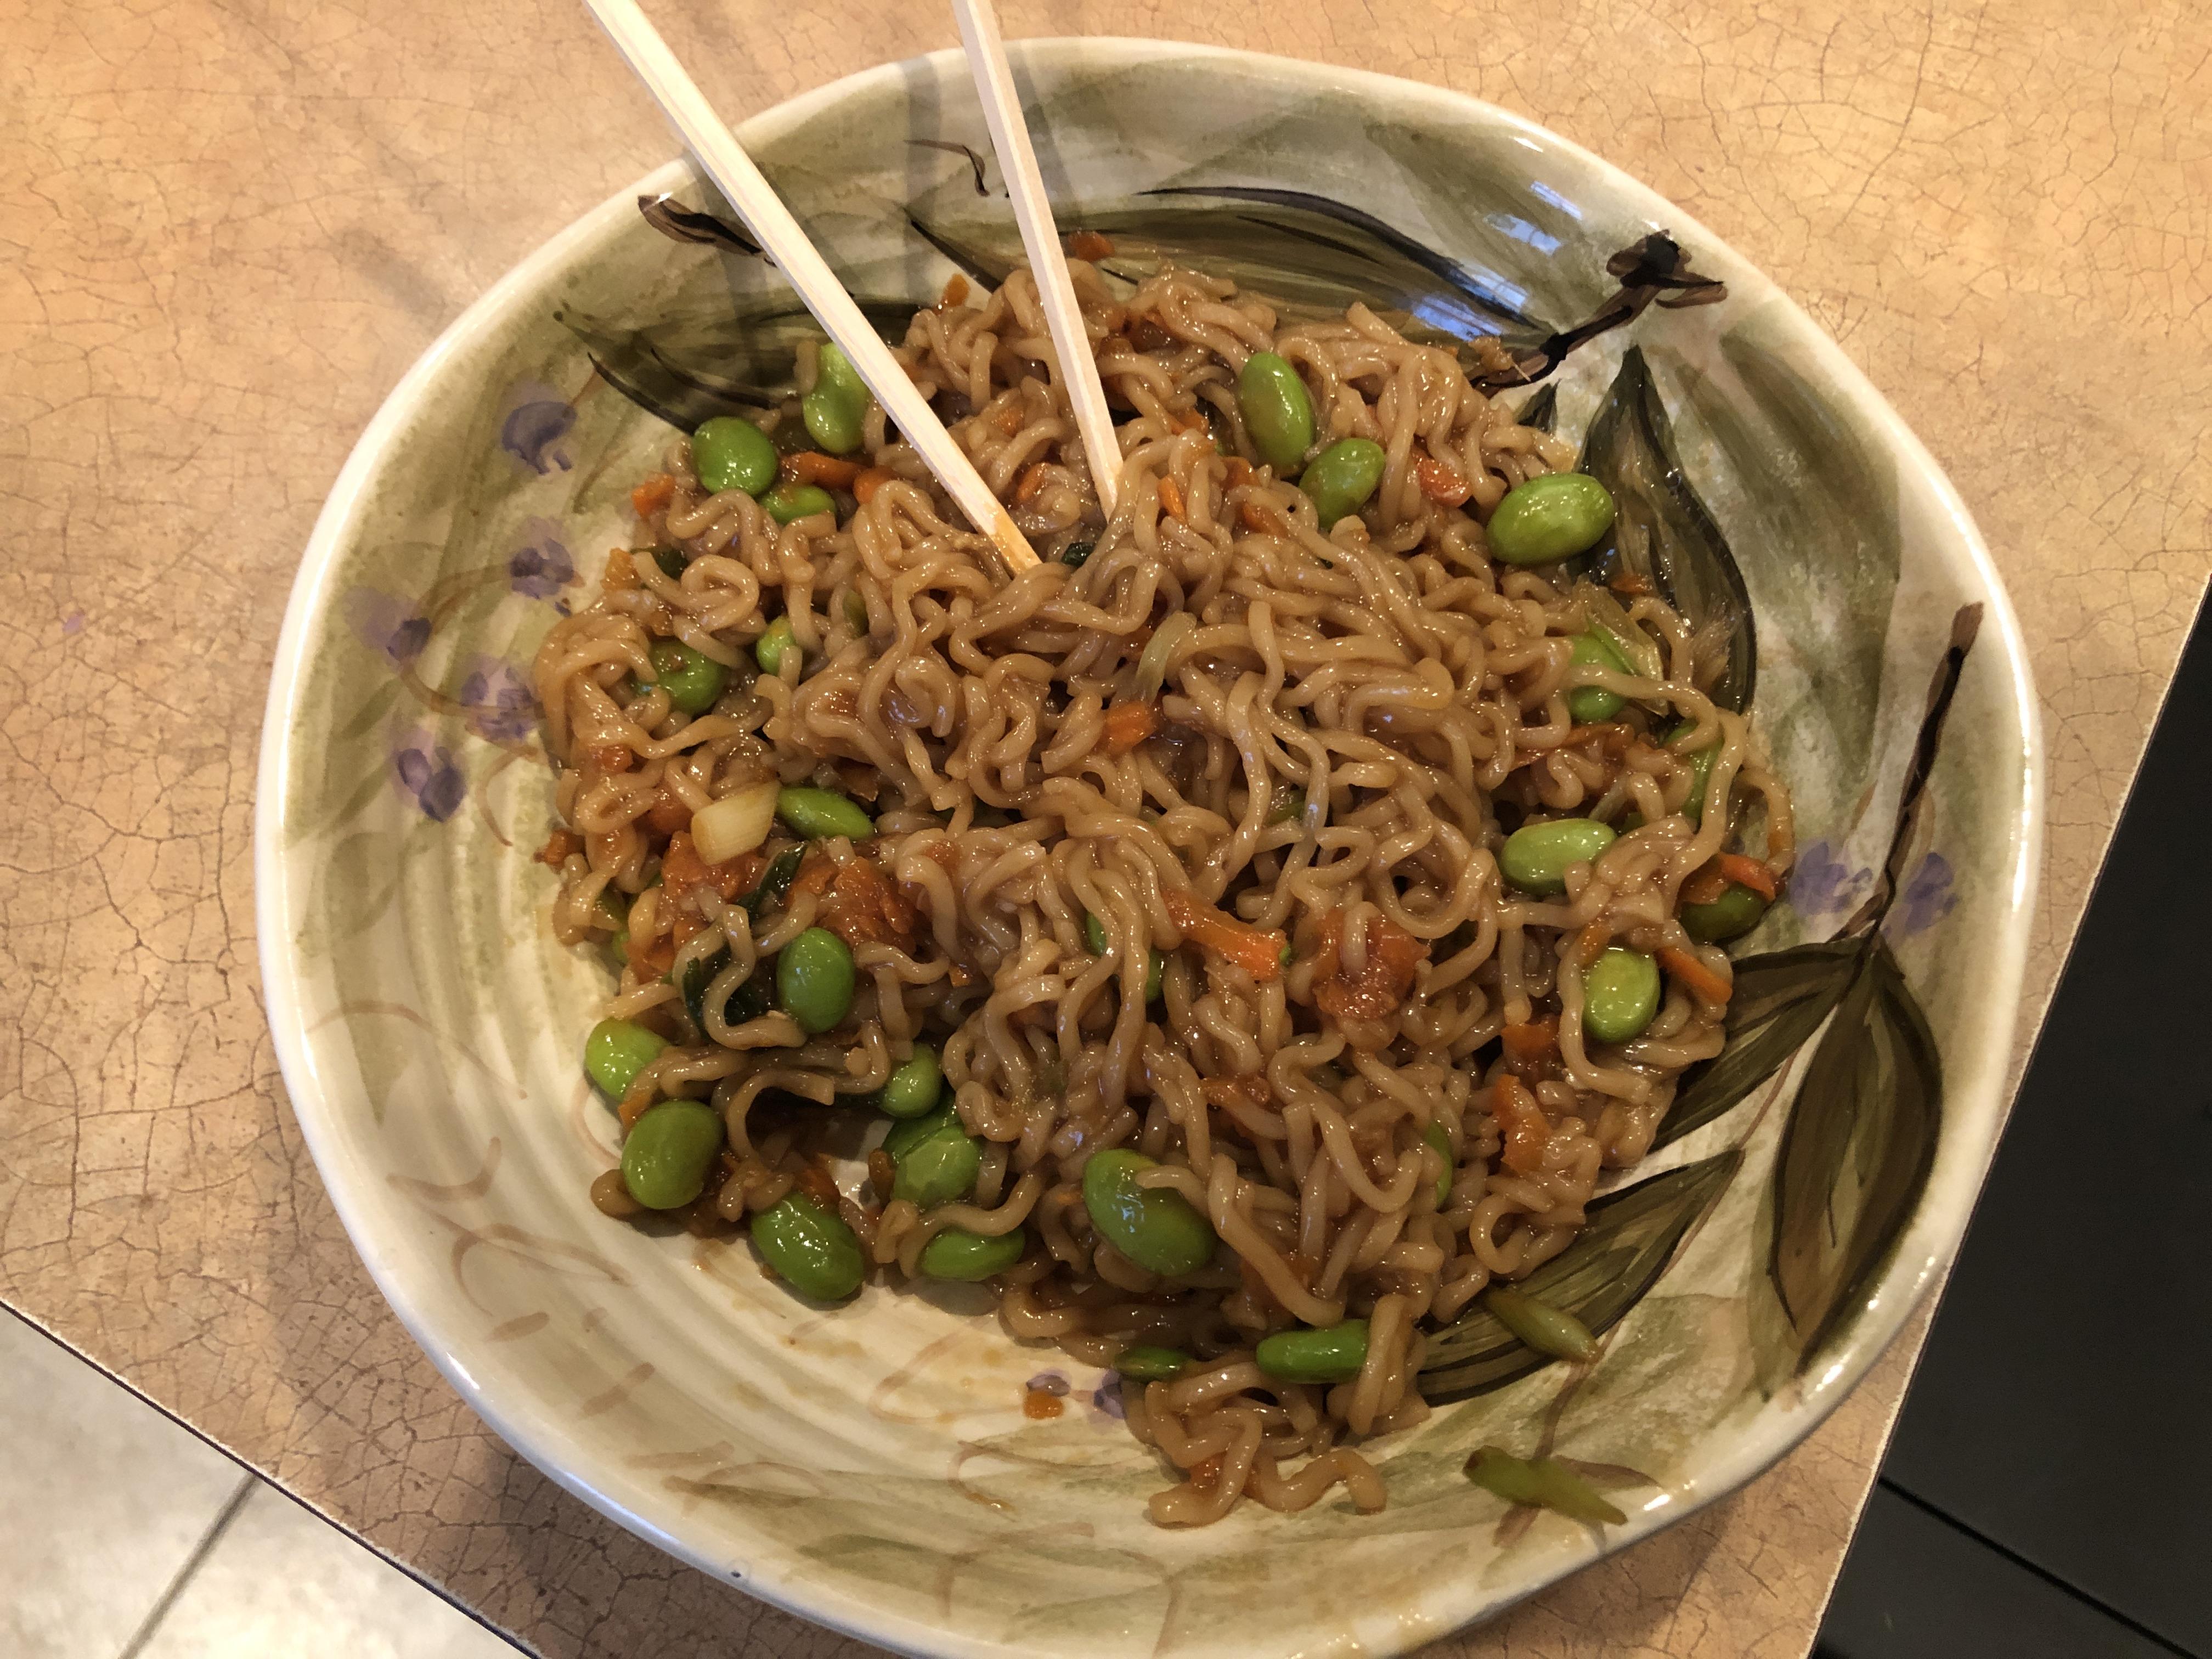 Ginger-Scallion Ramen Noodles